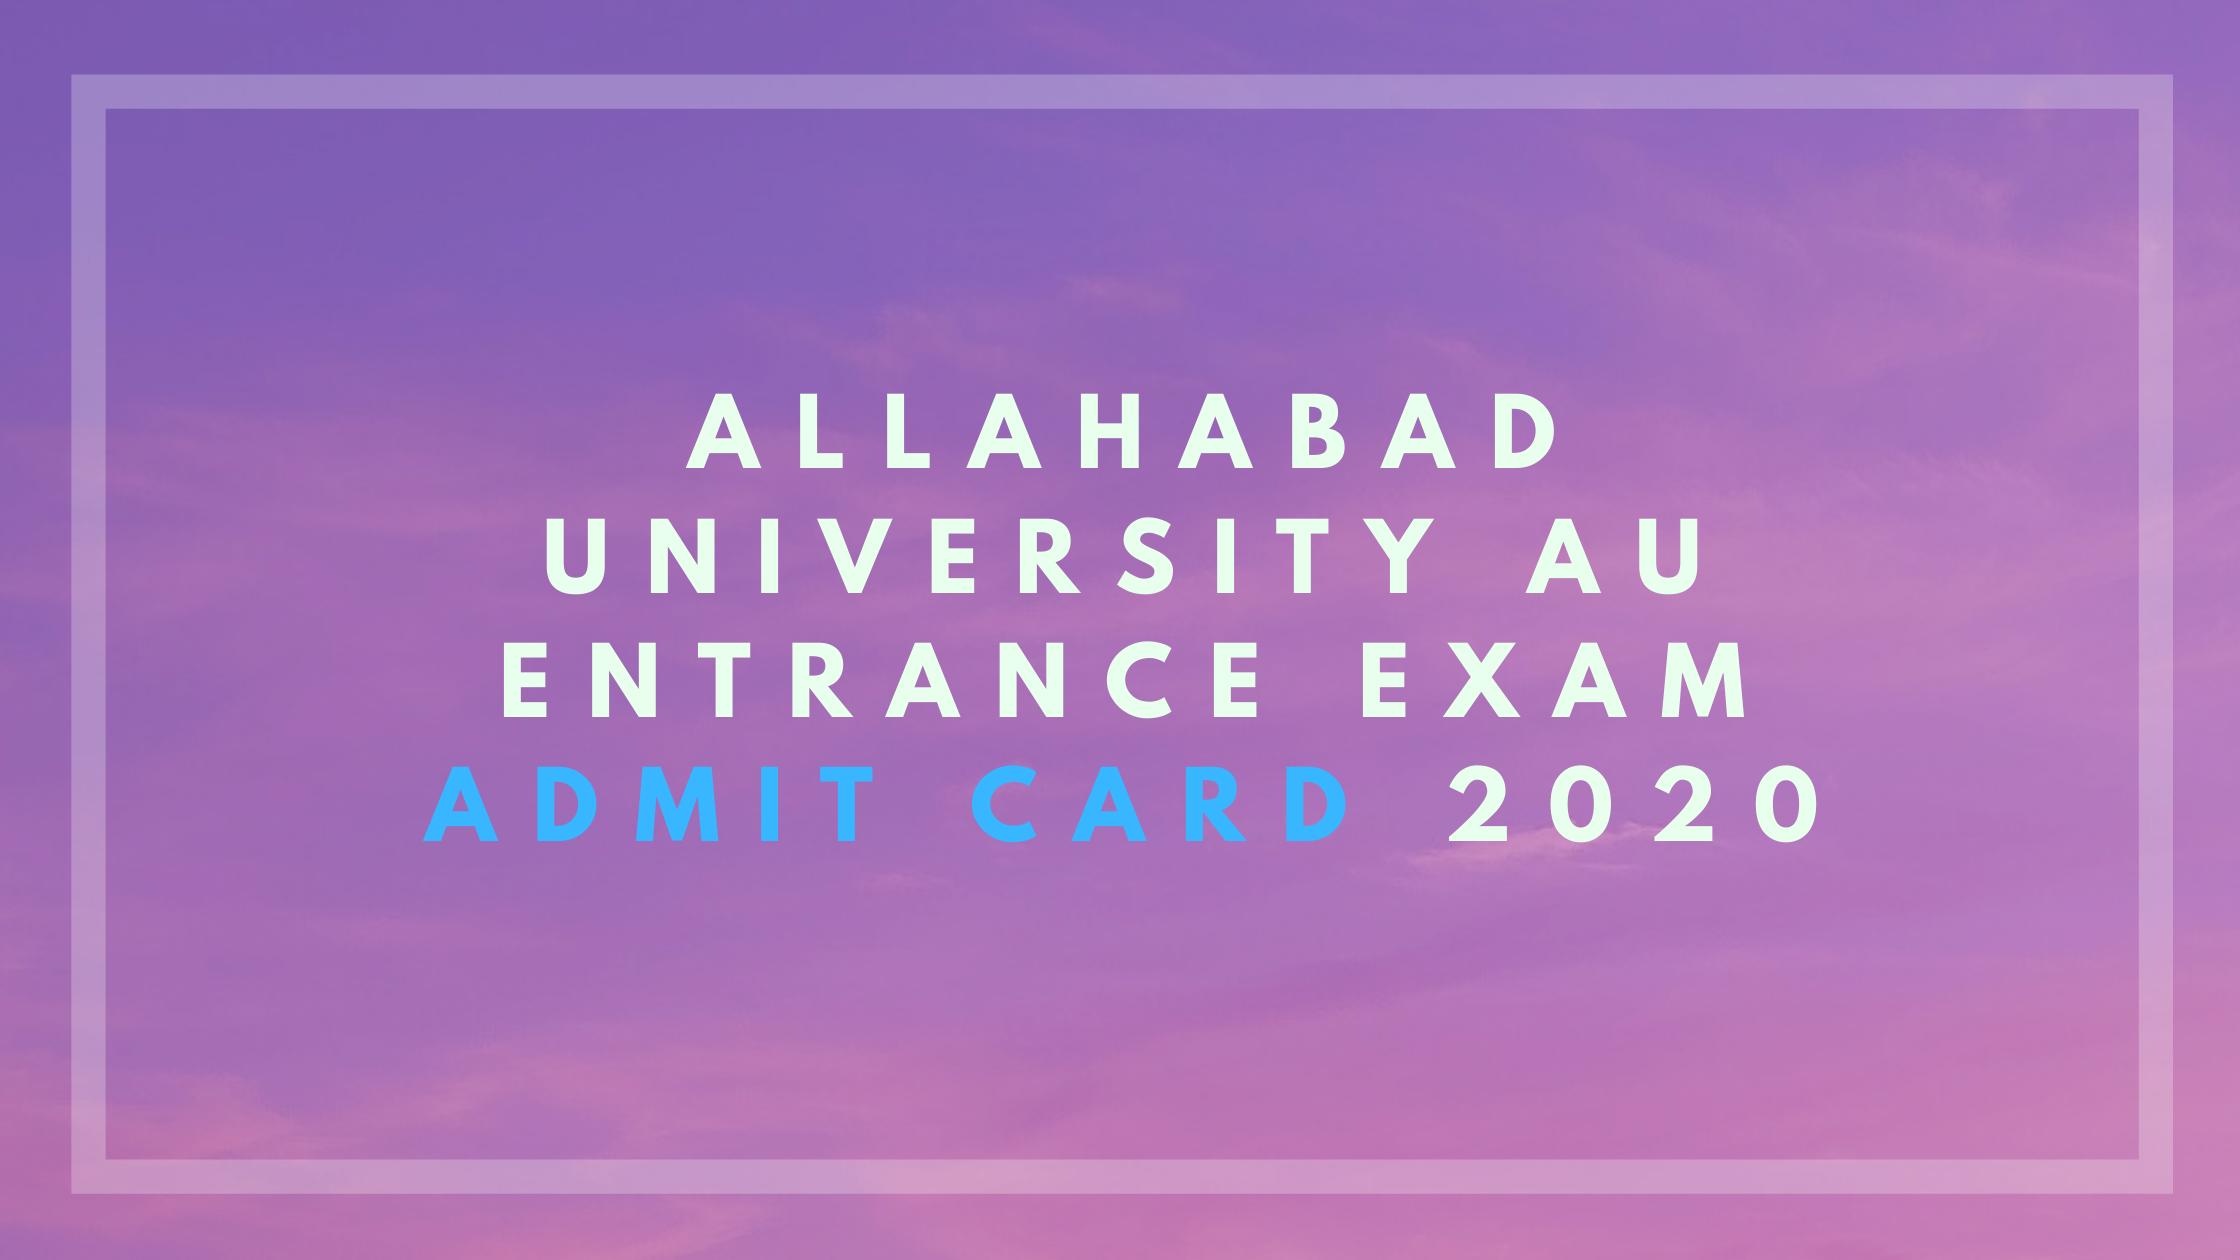 Allahabad University AU Entrance Exam Admit Card 2020